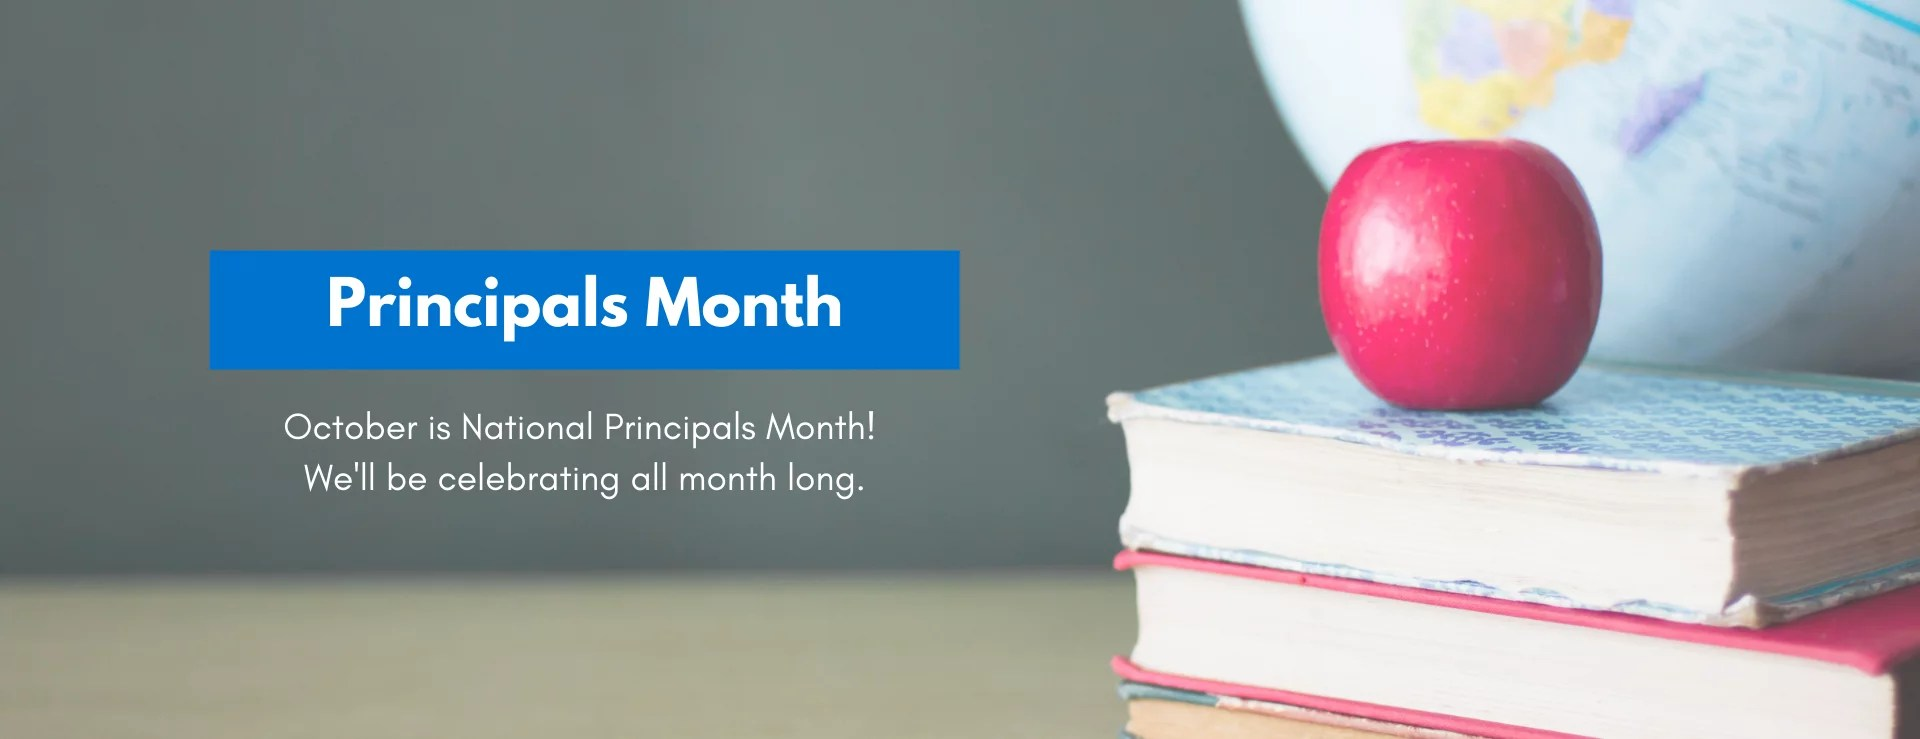 copy-of-principals-month-web-banner